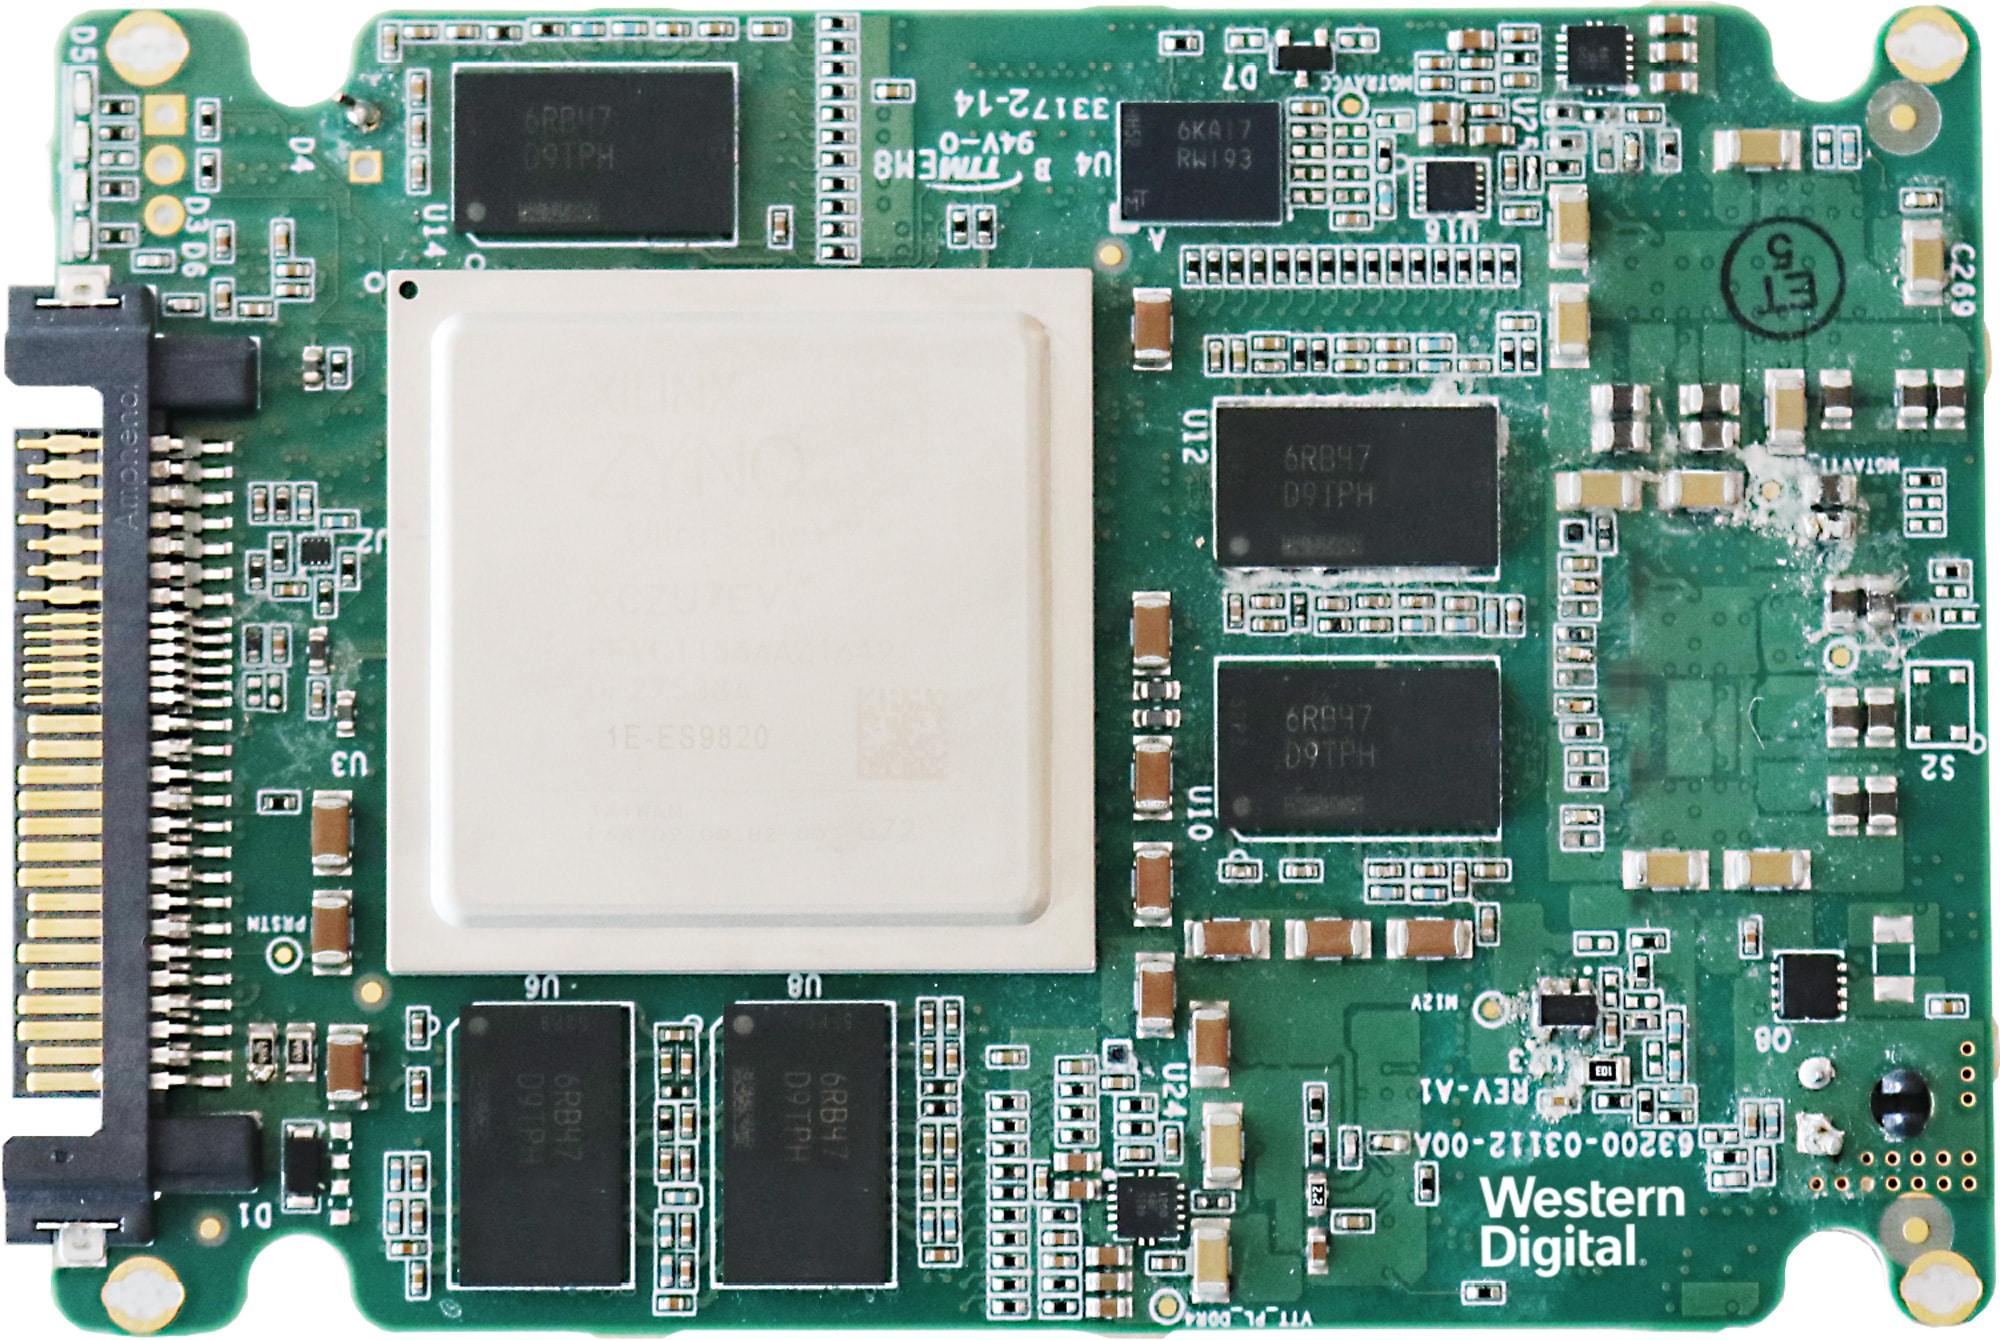 Western Digital machine learning accelerator